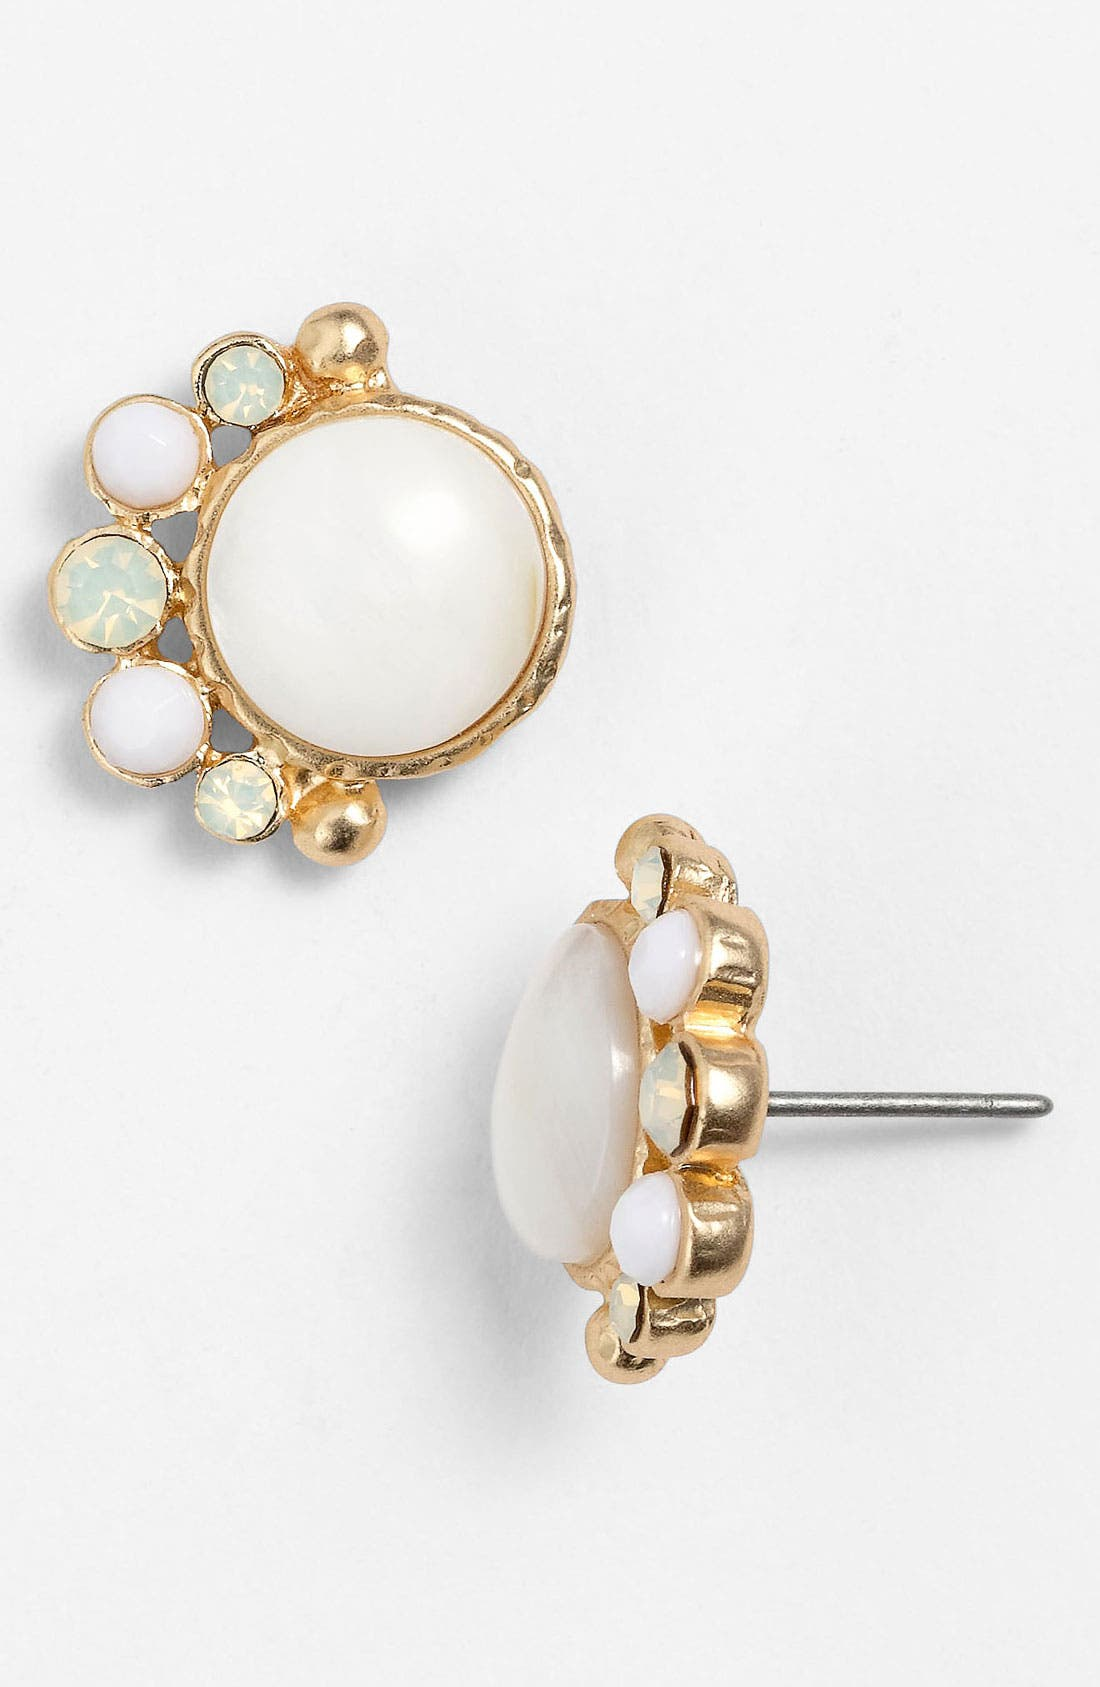 Alternate Image 1 Selected - Nordstrom 'Santorini' Small Stud Earrings